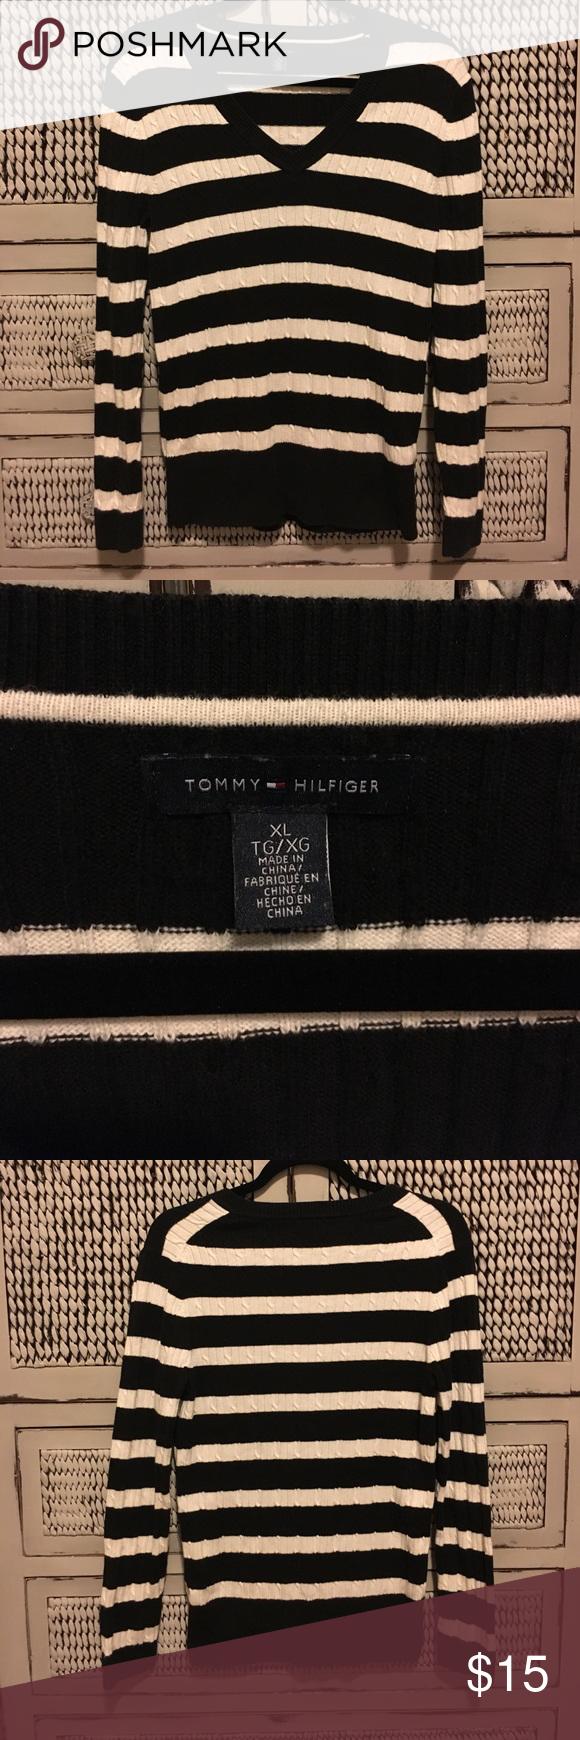 TOMMY HILFIGER SWEATER WOMENS SIZE XL Tommy Hilfiger sweater women's size XL. Black and white striped V neck. Great condition!!! Tommy Hilfiger Sweaters V-Necks